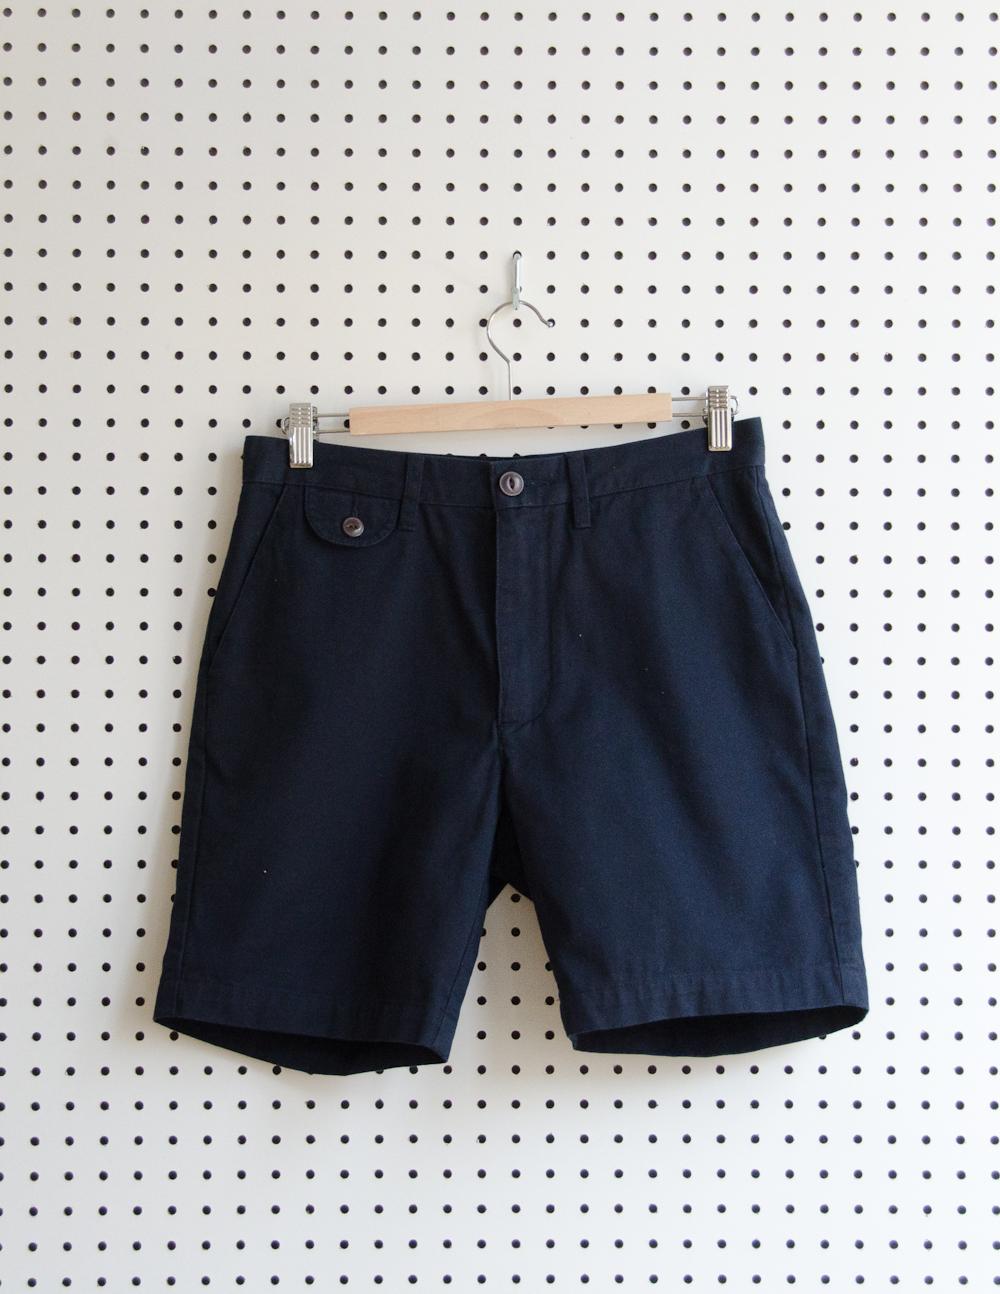 Penfield - Grafton Twill Bermuda Shorts